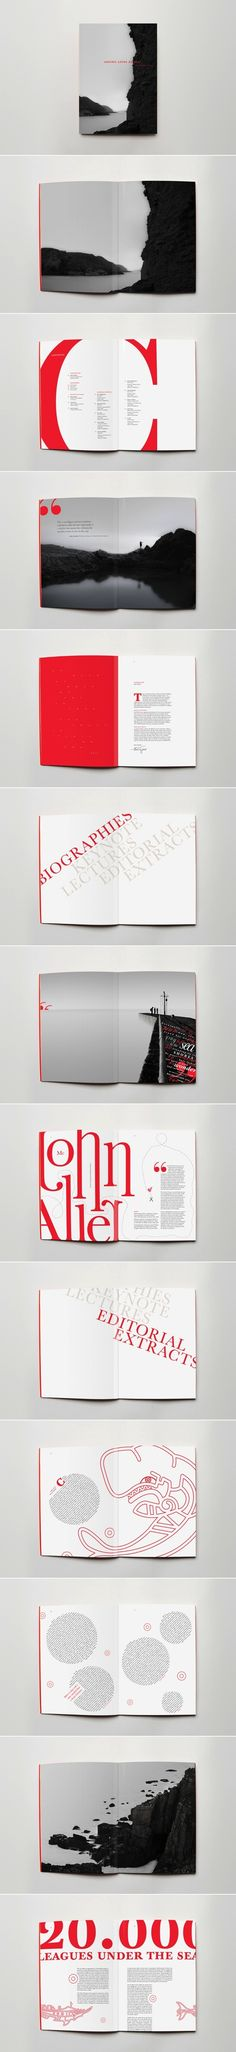 Dominance in graphic design